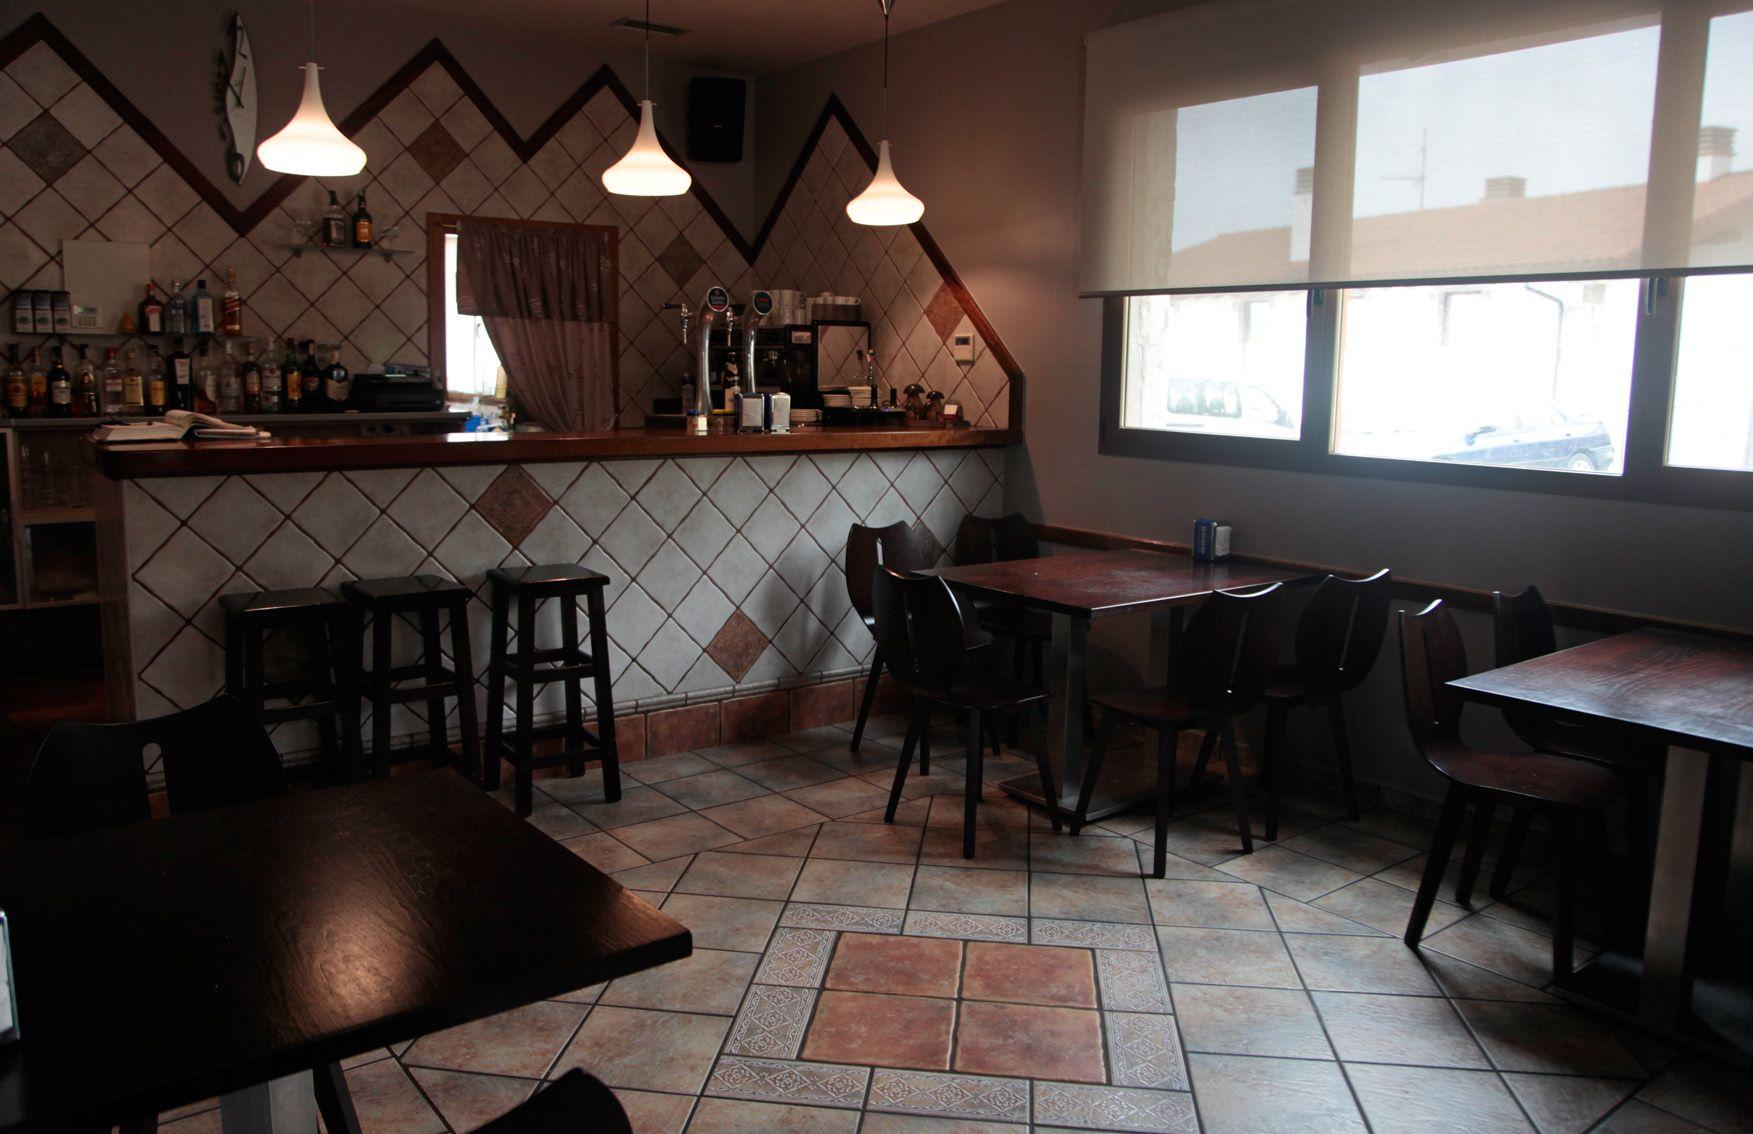 Foto 29 de Restaurante en Juslapeña   Restaurante Casa Arteta